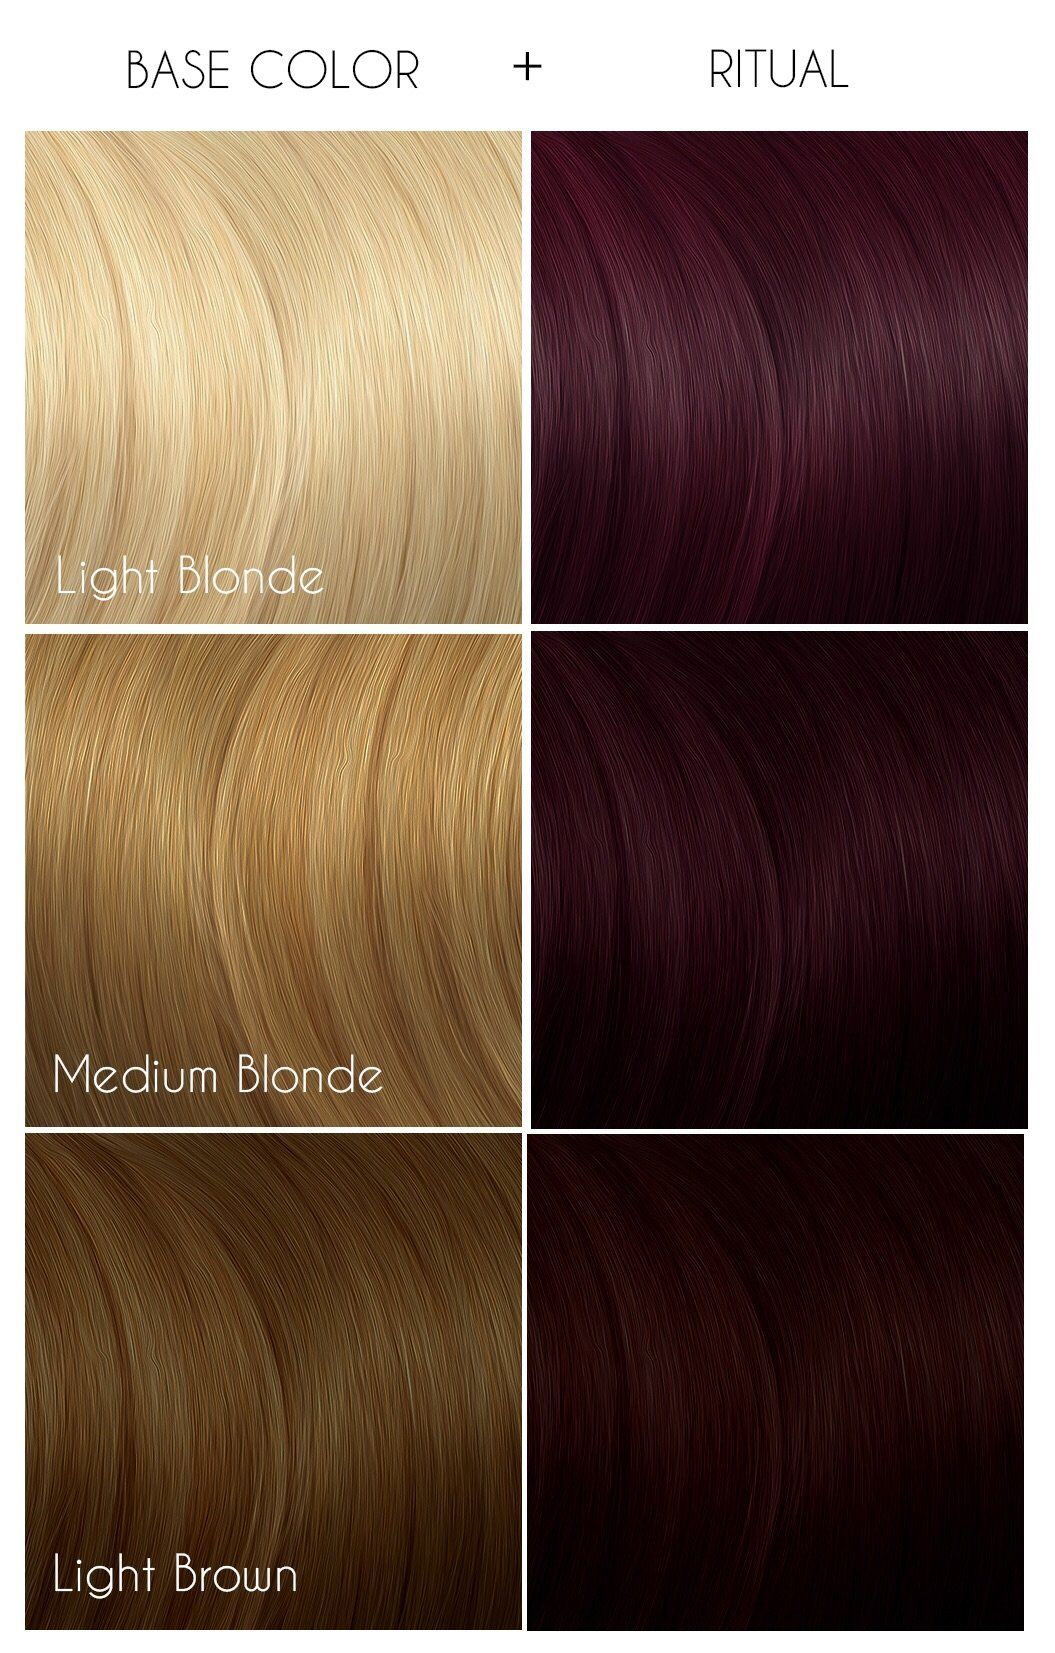 Ritual In 2020 Arctic Fox Hair Dye Arctic Fox Hair Color